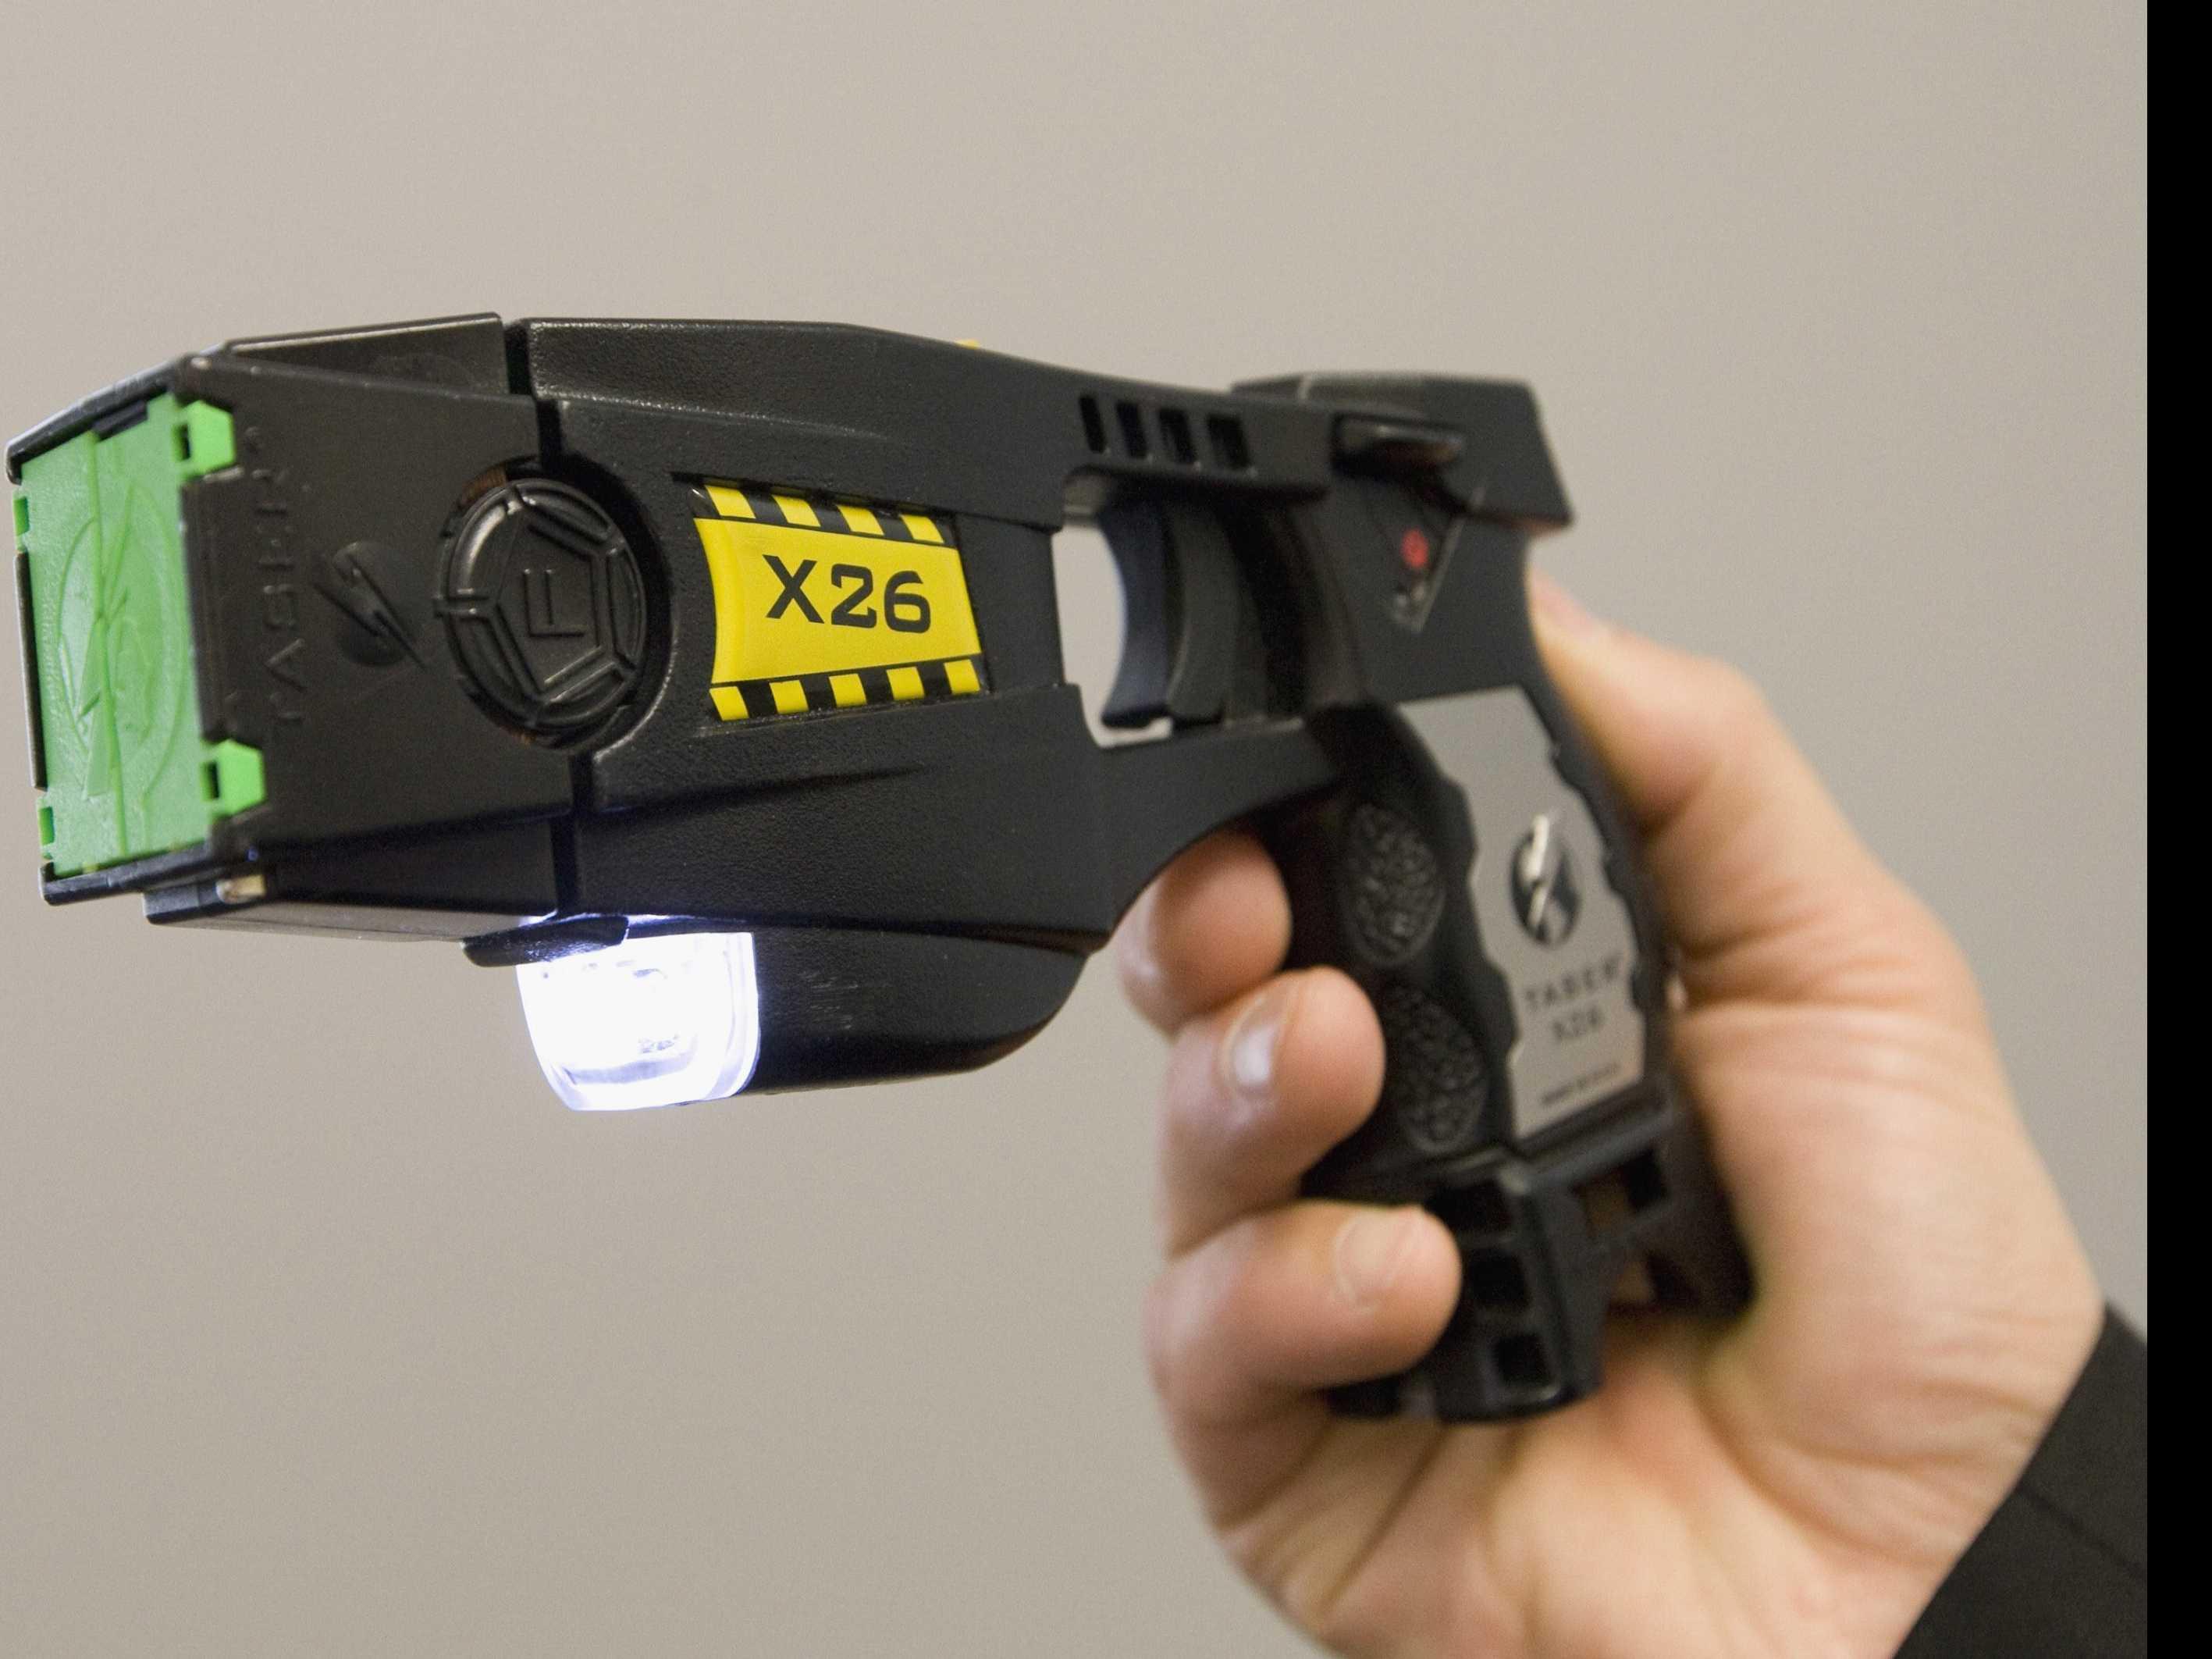 Judge Says New York's Stun Gun Ban is Unconstitutional